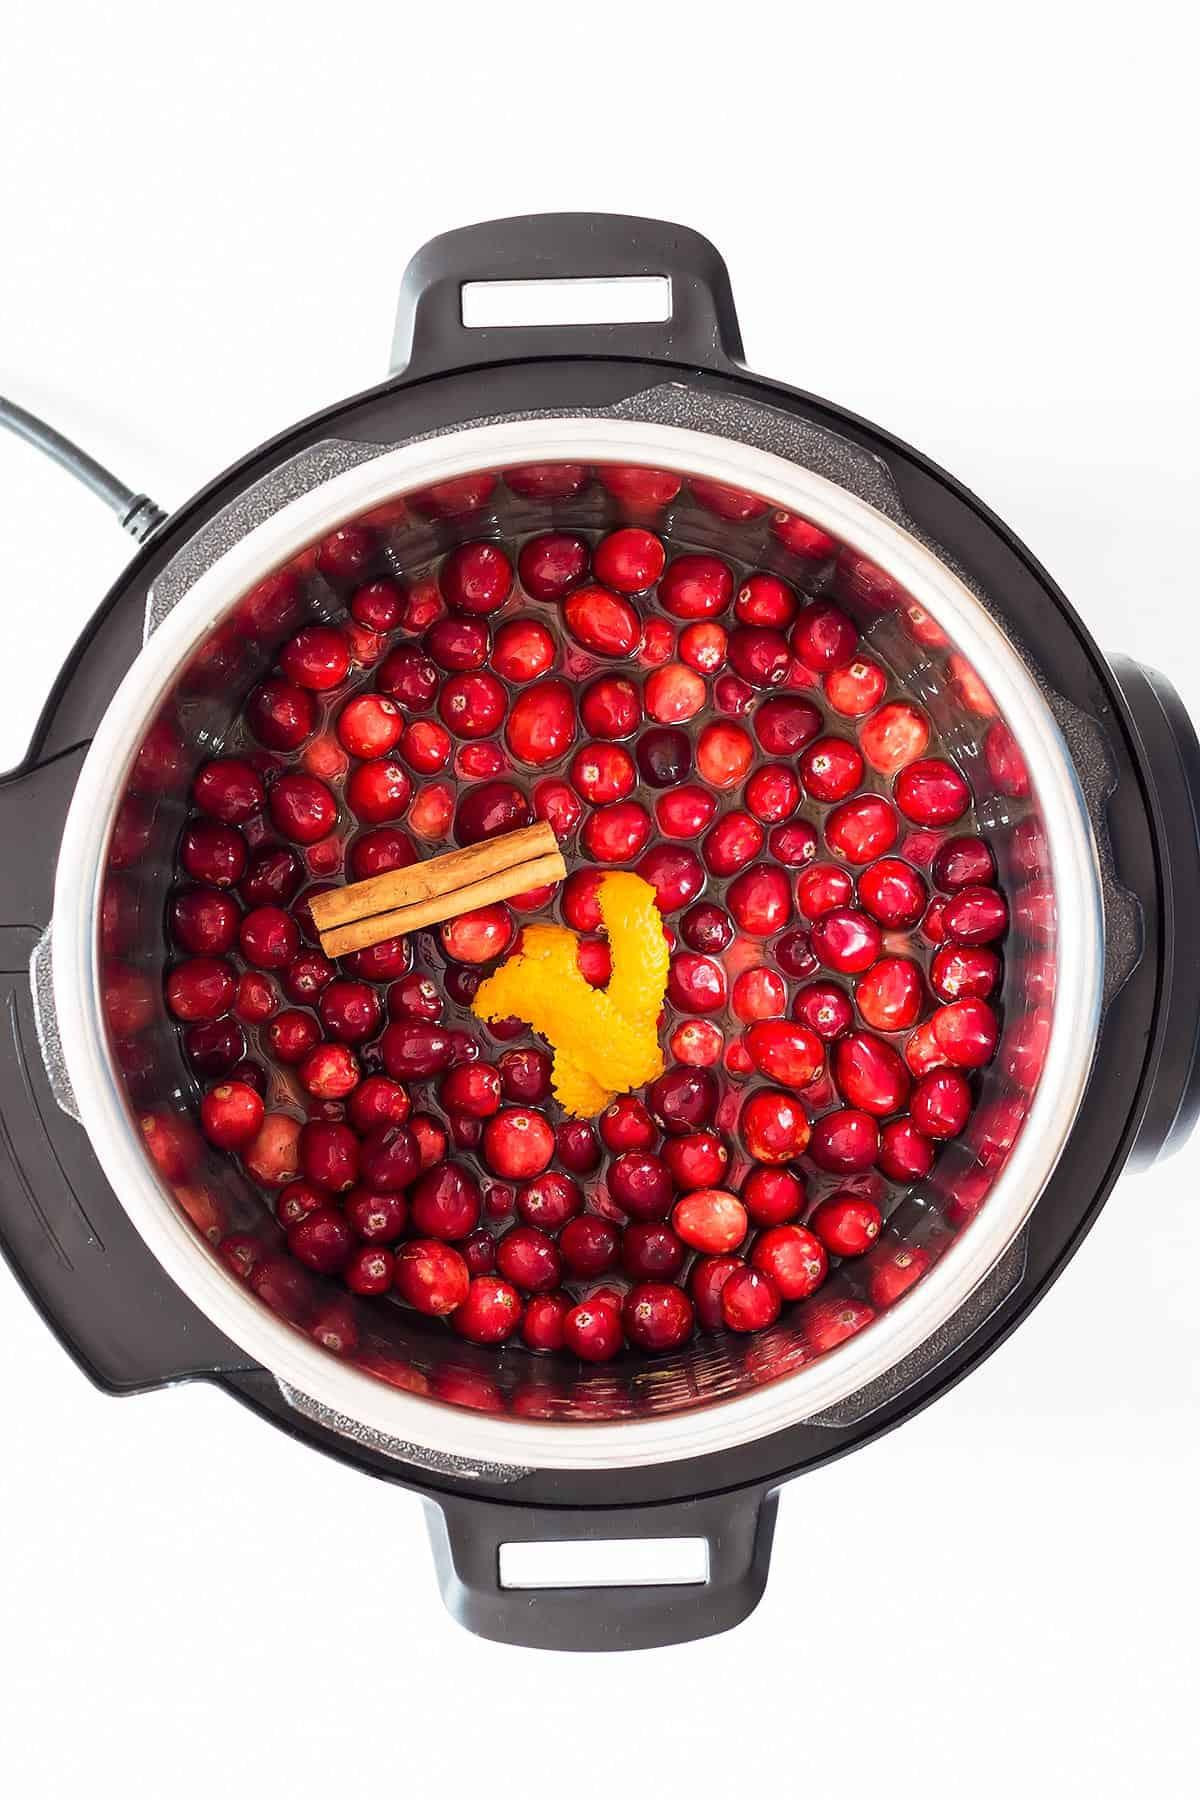 Cranberry Sauce Ingredients in Instant Pot